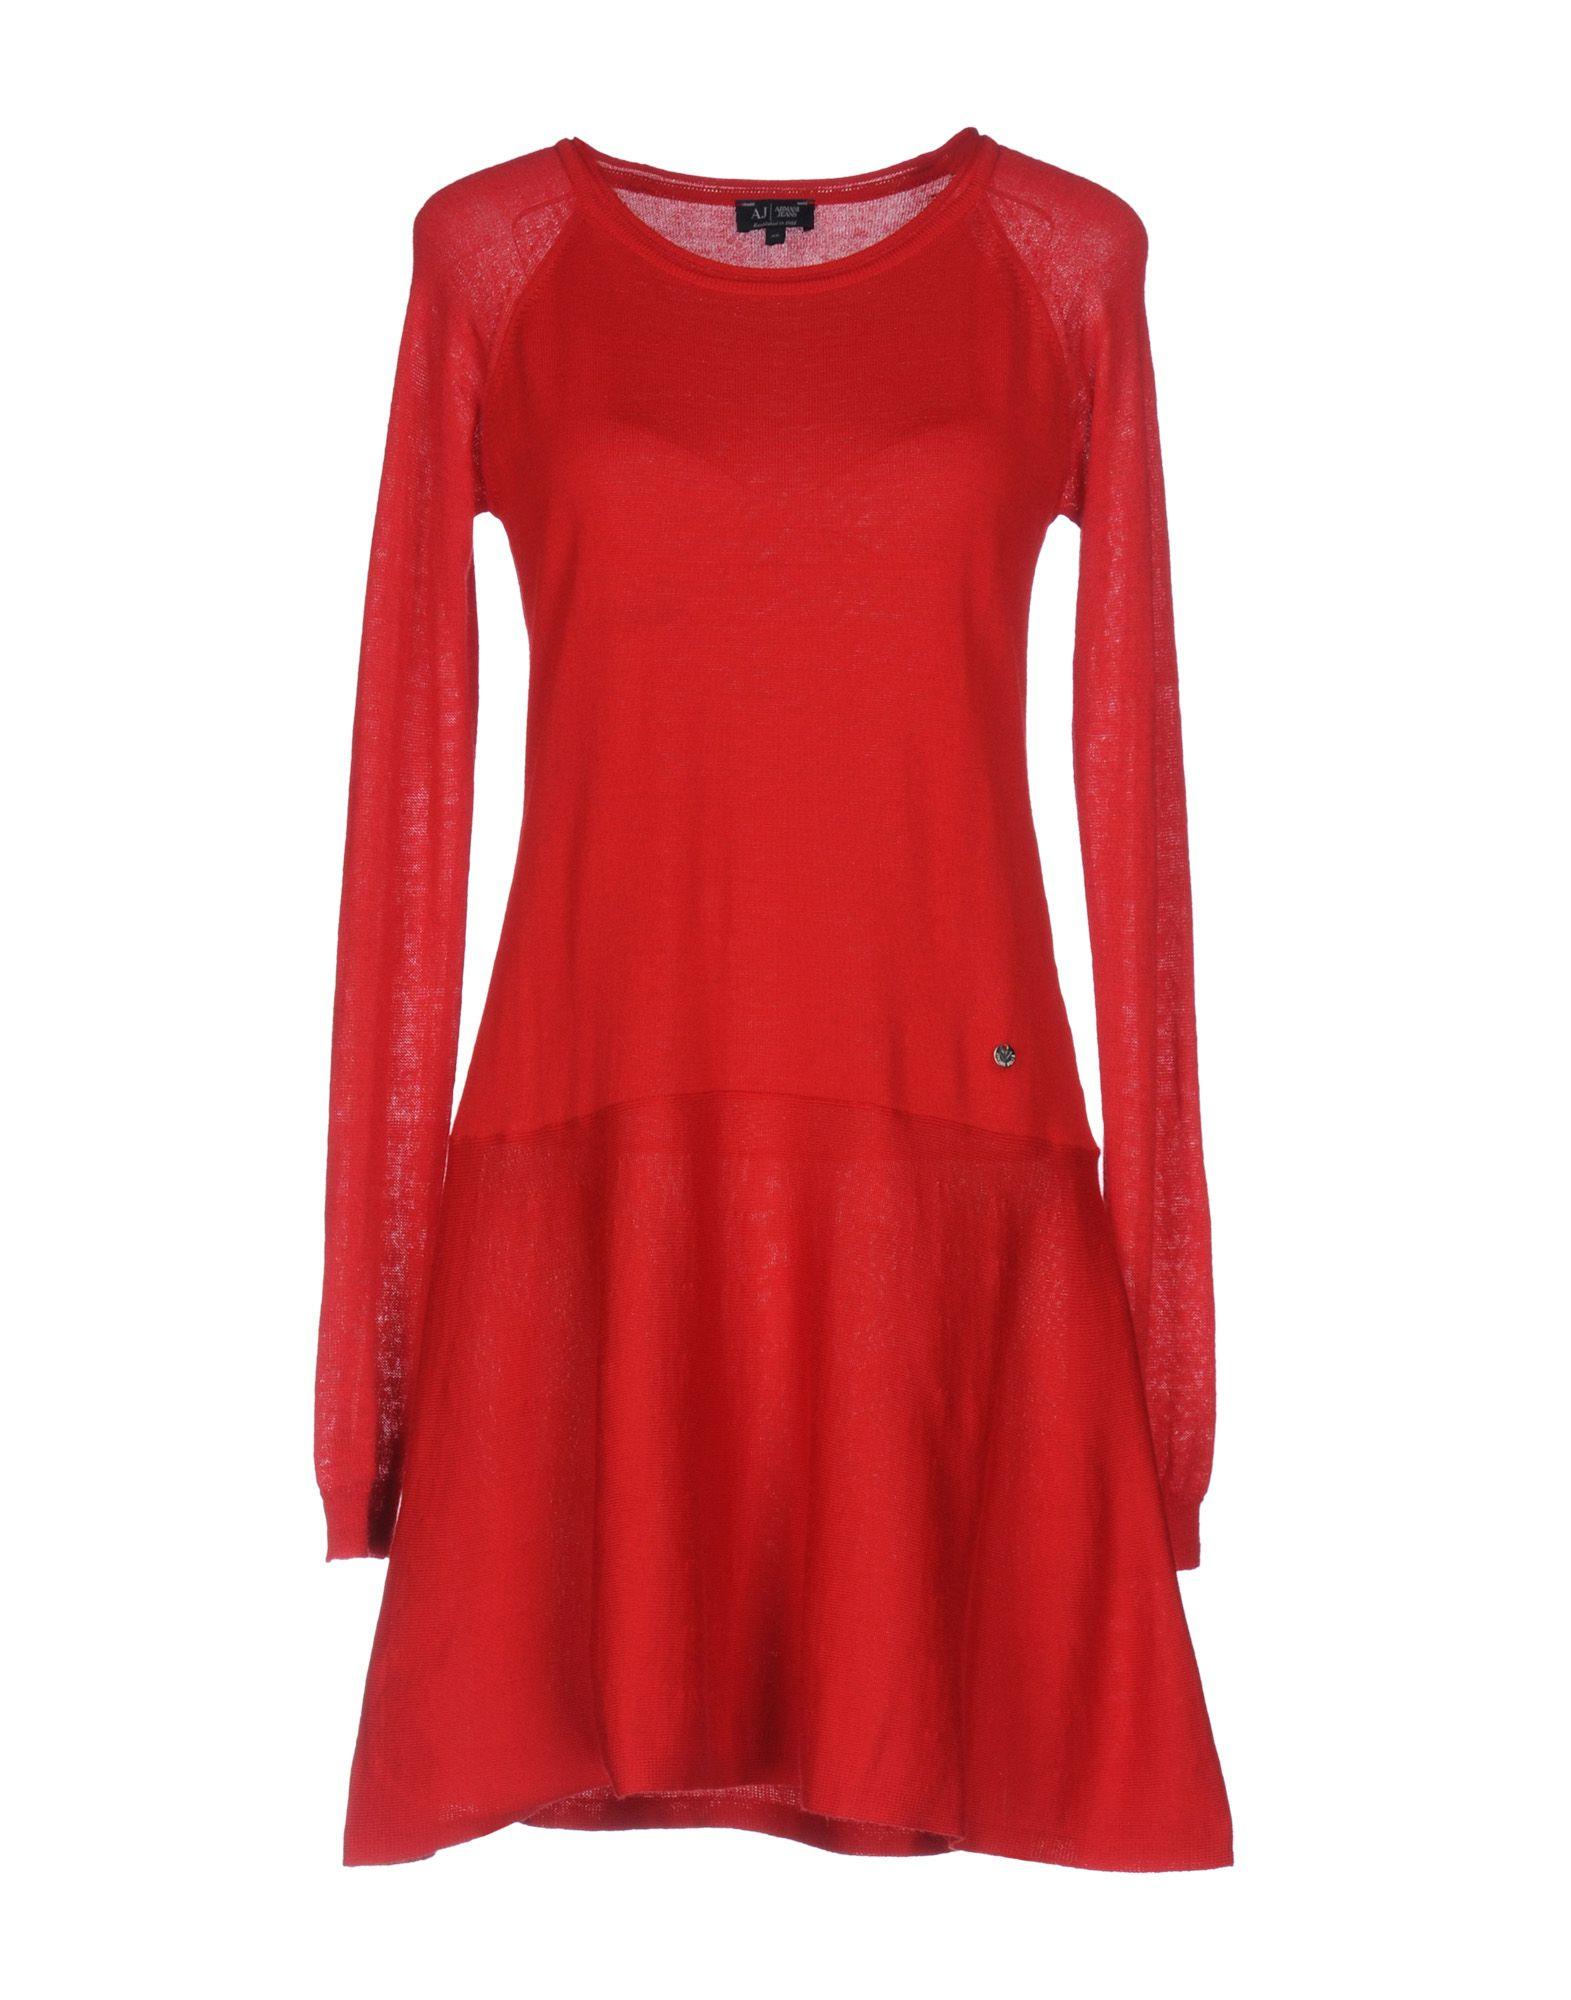 ARMANI JEANS Damen Kurzes Kleid Farbe Rot Größe 4